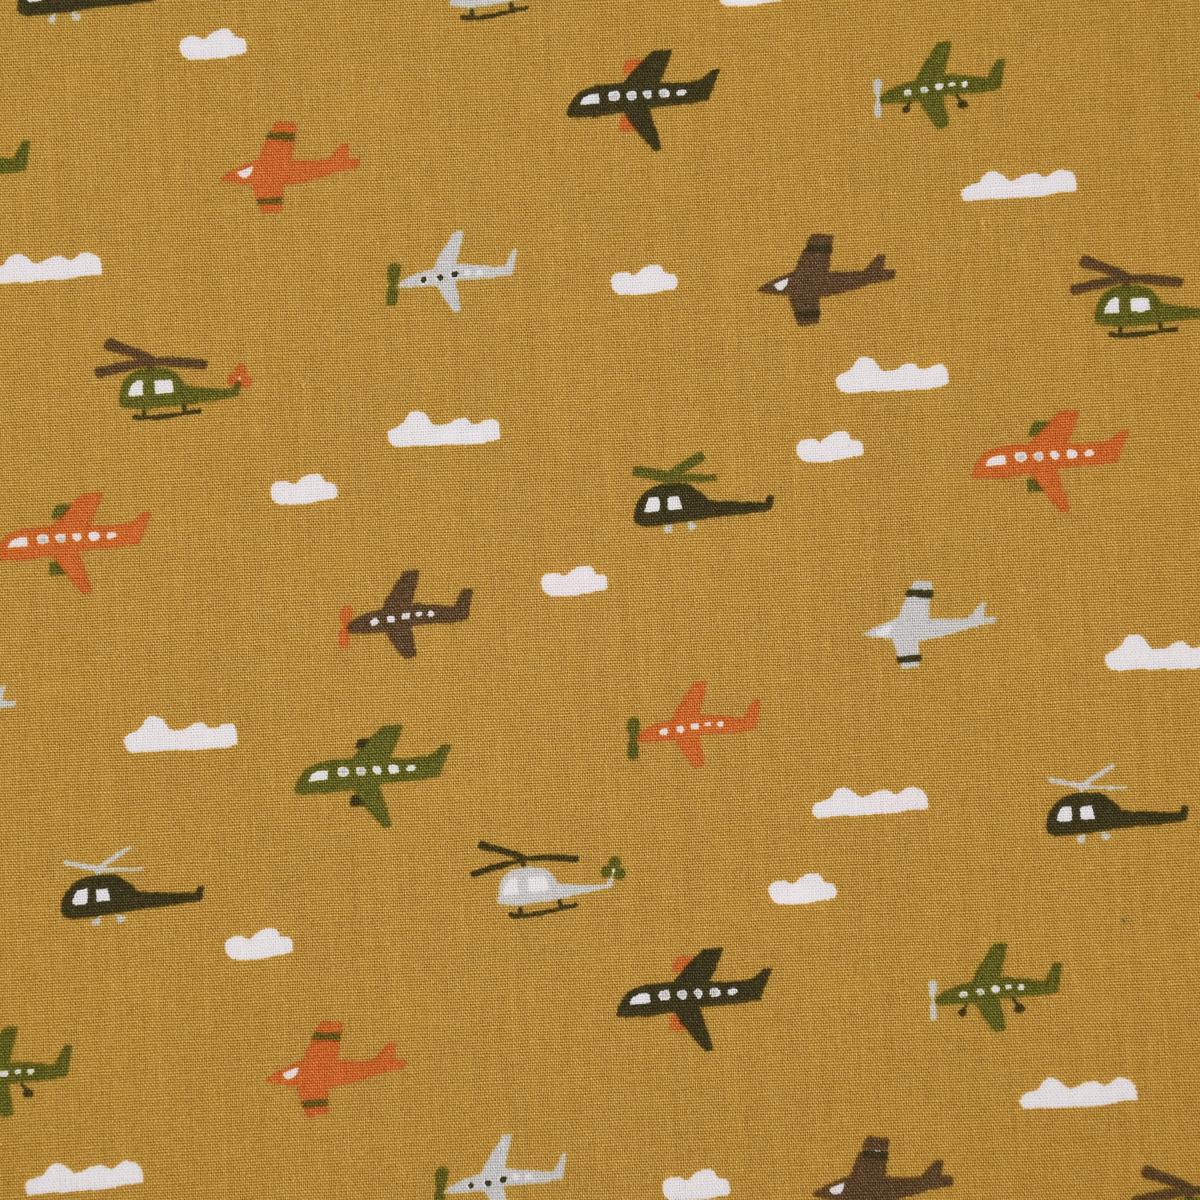 Baumwollstoff Popeline BRUSHED FLY WITH ME Flugzeug Wolke ocker weiß bunt 1,45m Breite